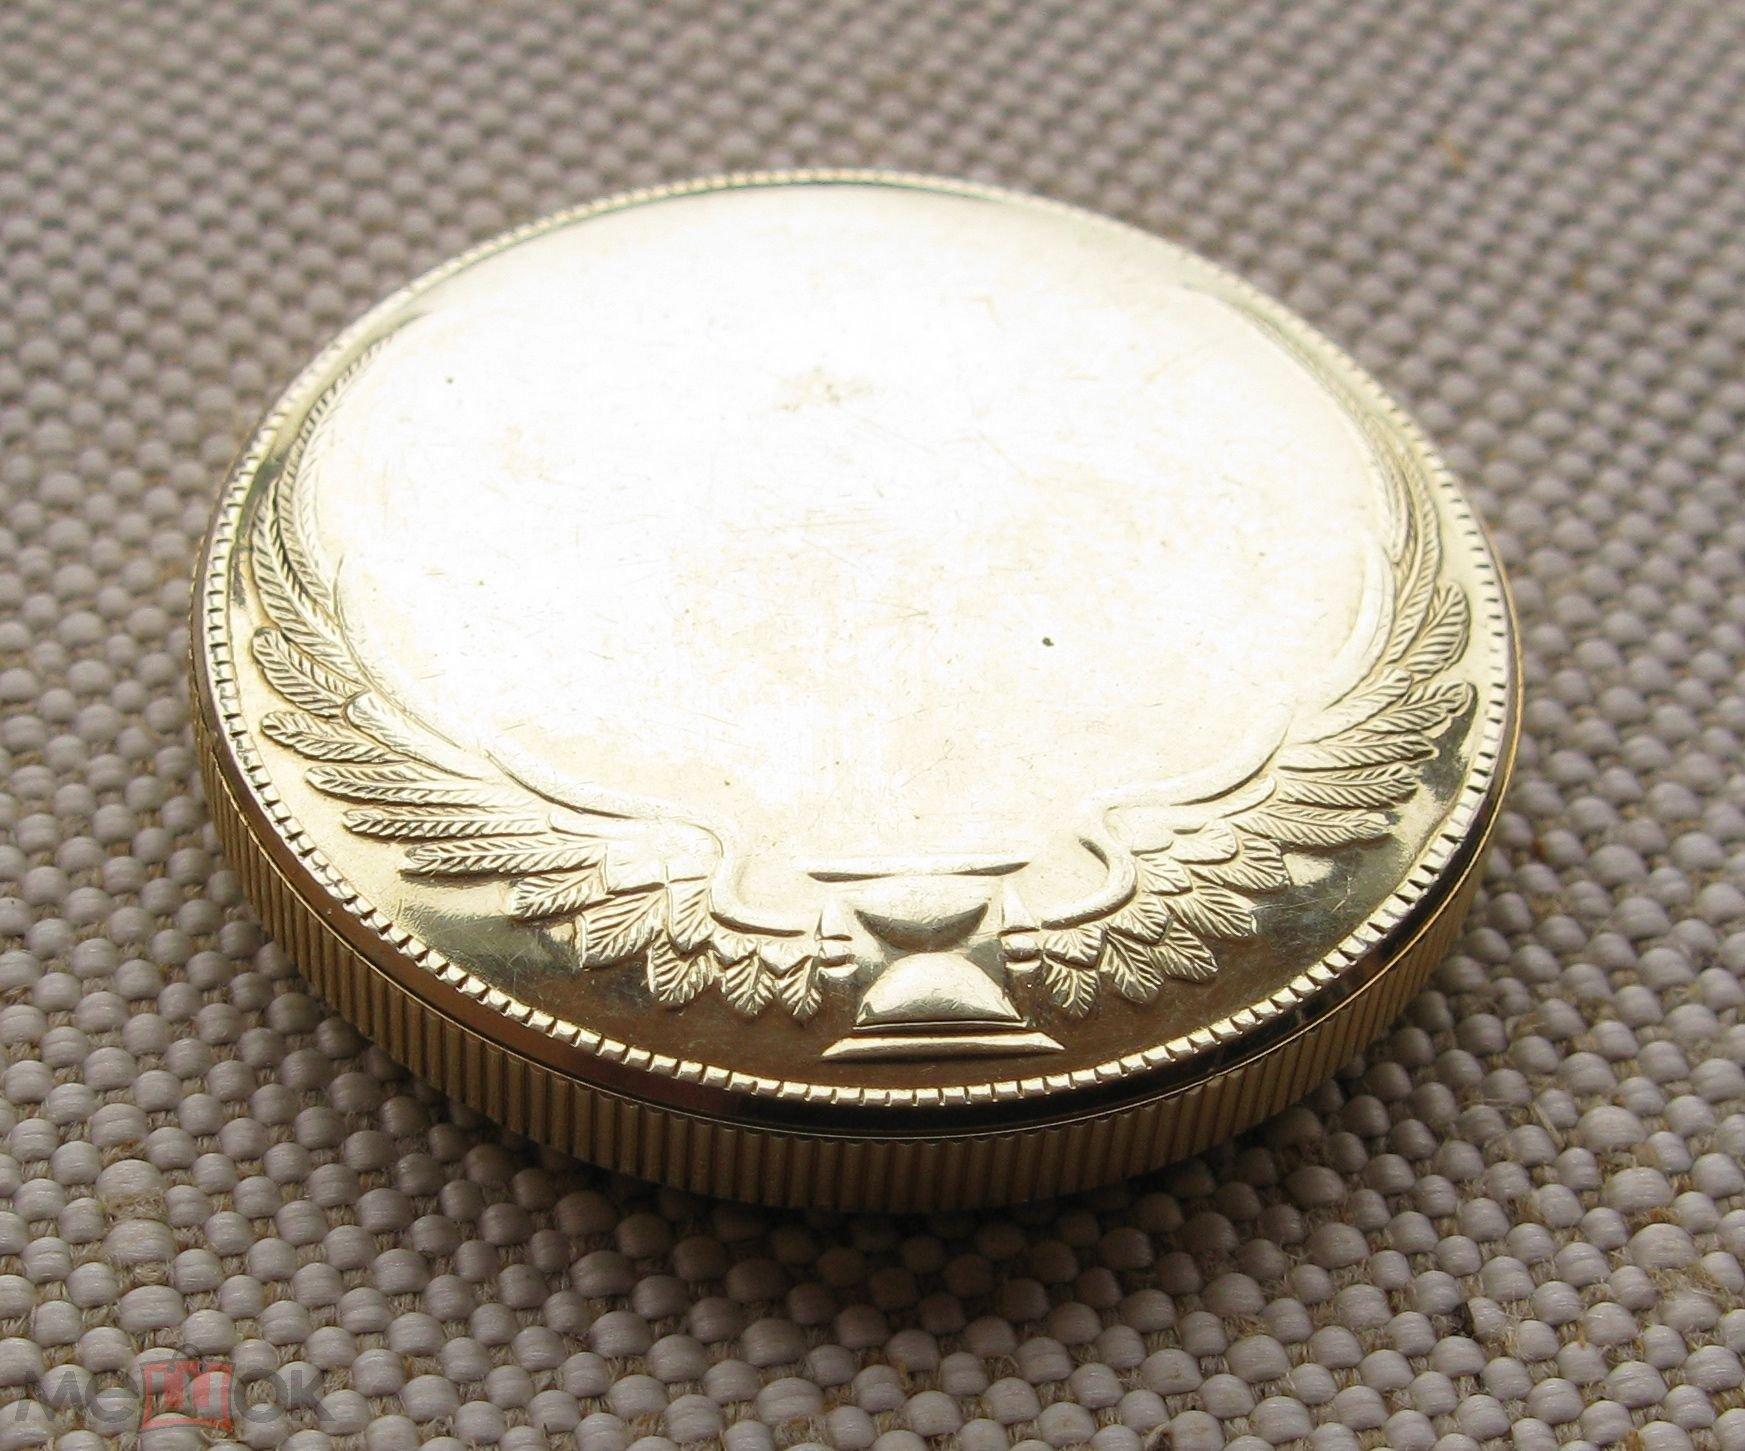 Карманные часы, BENRUS, Монета-часы, Швейцария, золото 585 проба, 36.7 грамма, 35.5мм диаметр, 6.5мм